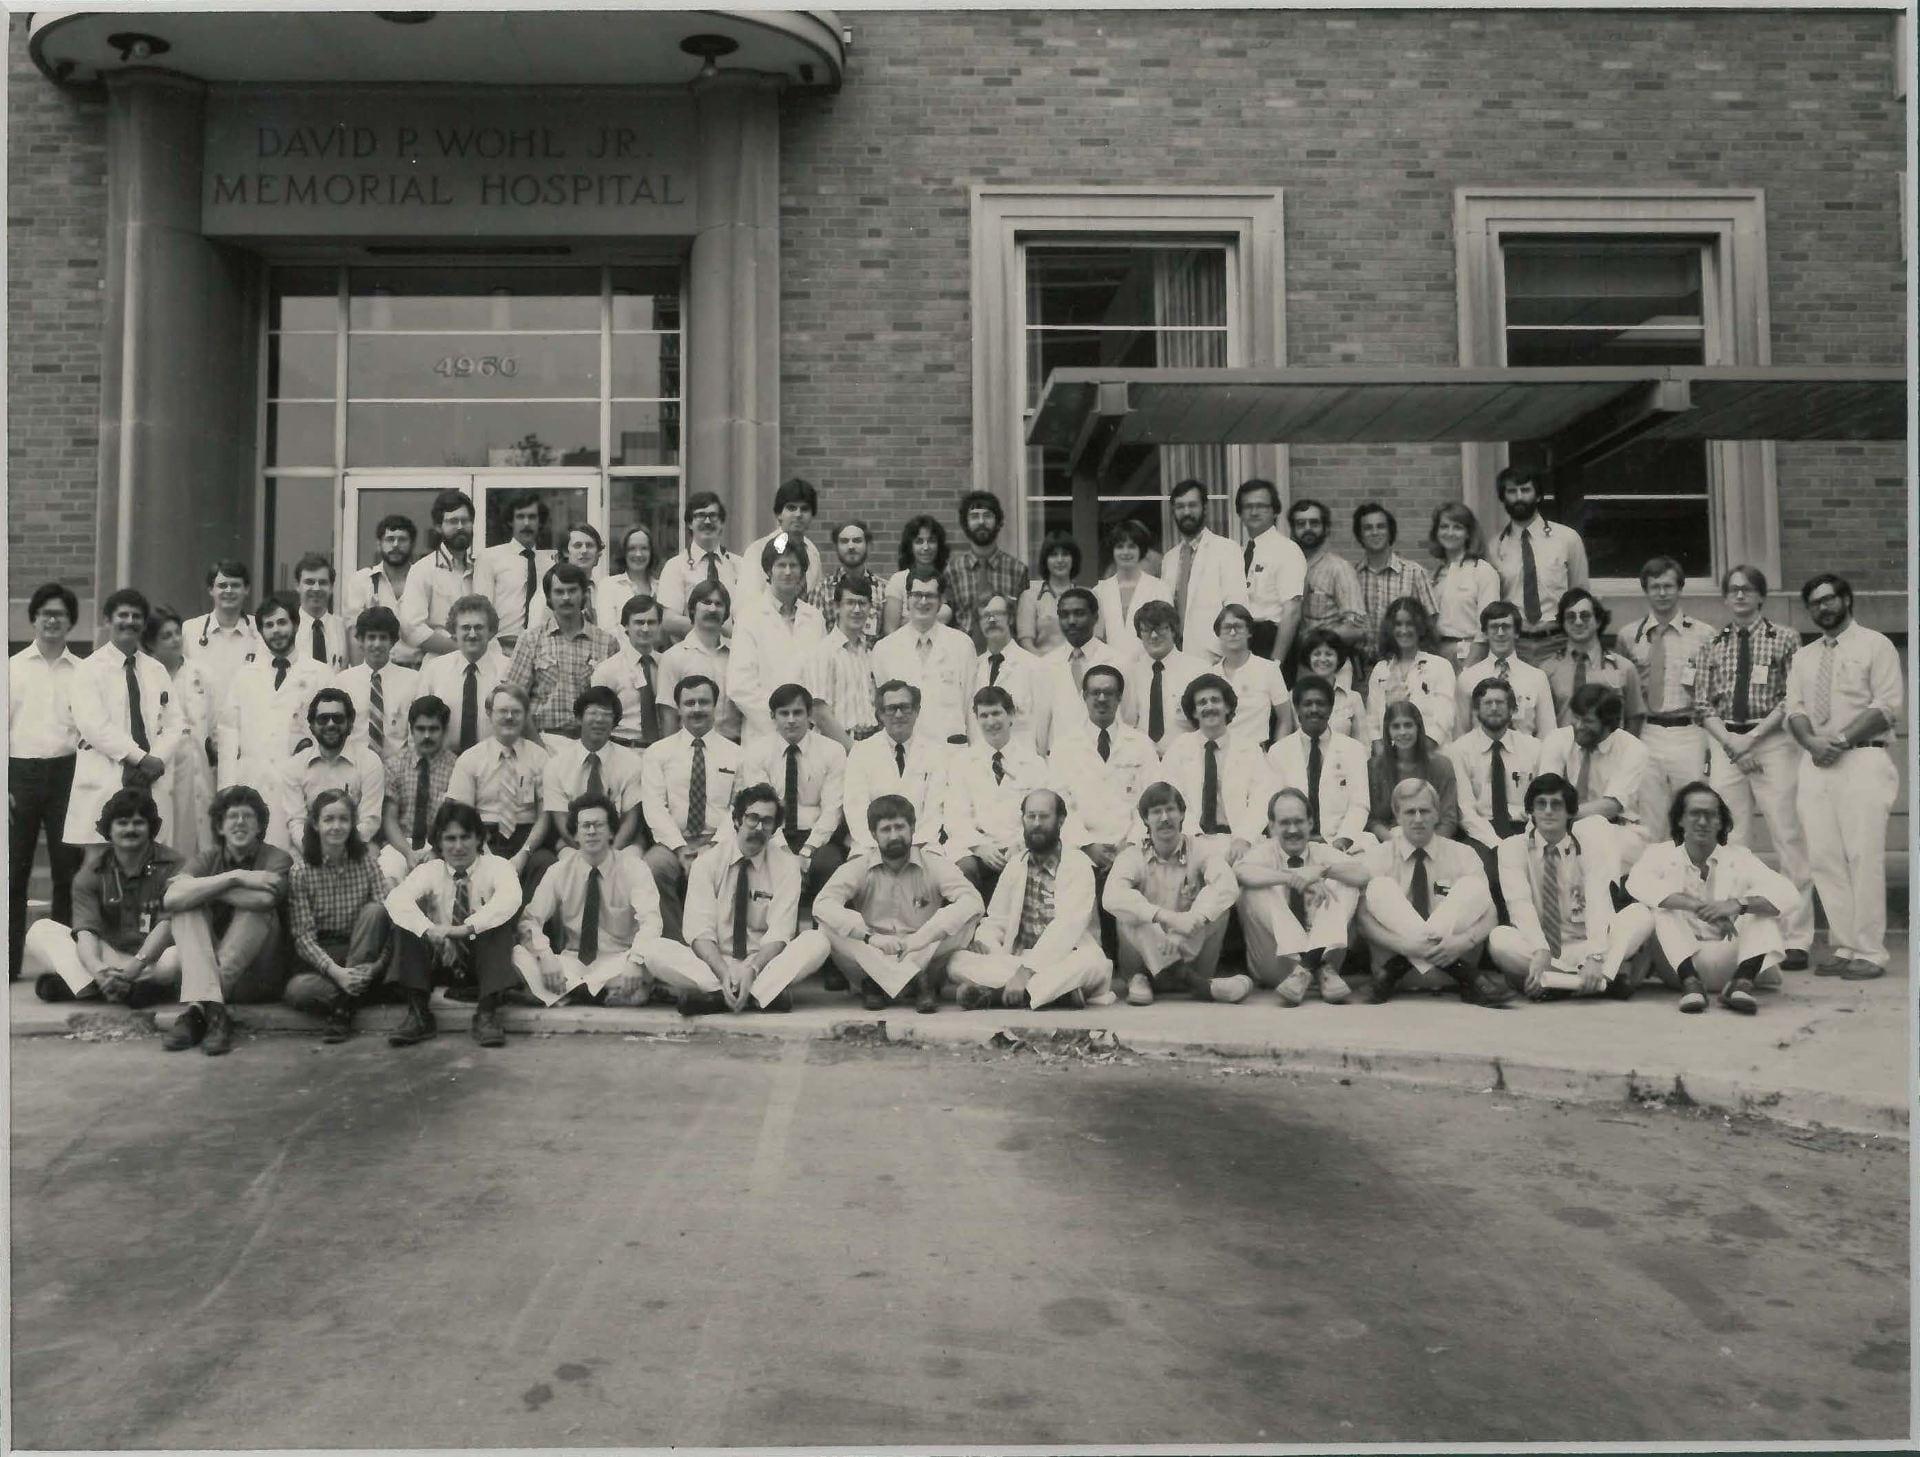 1981 Housestaff Photo